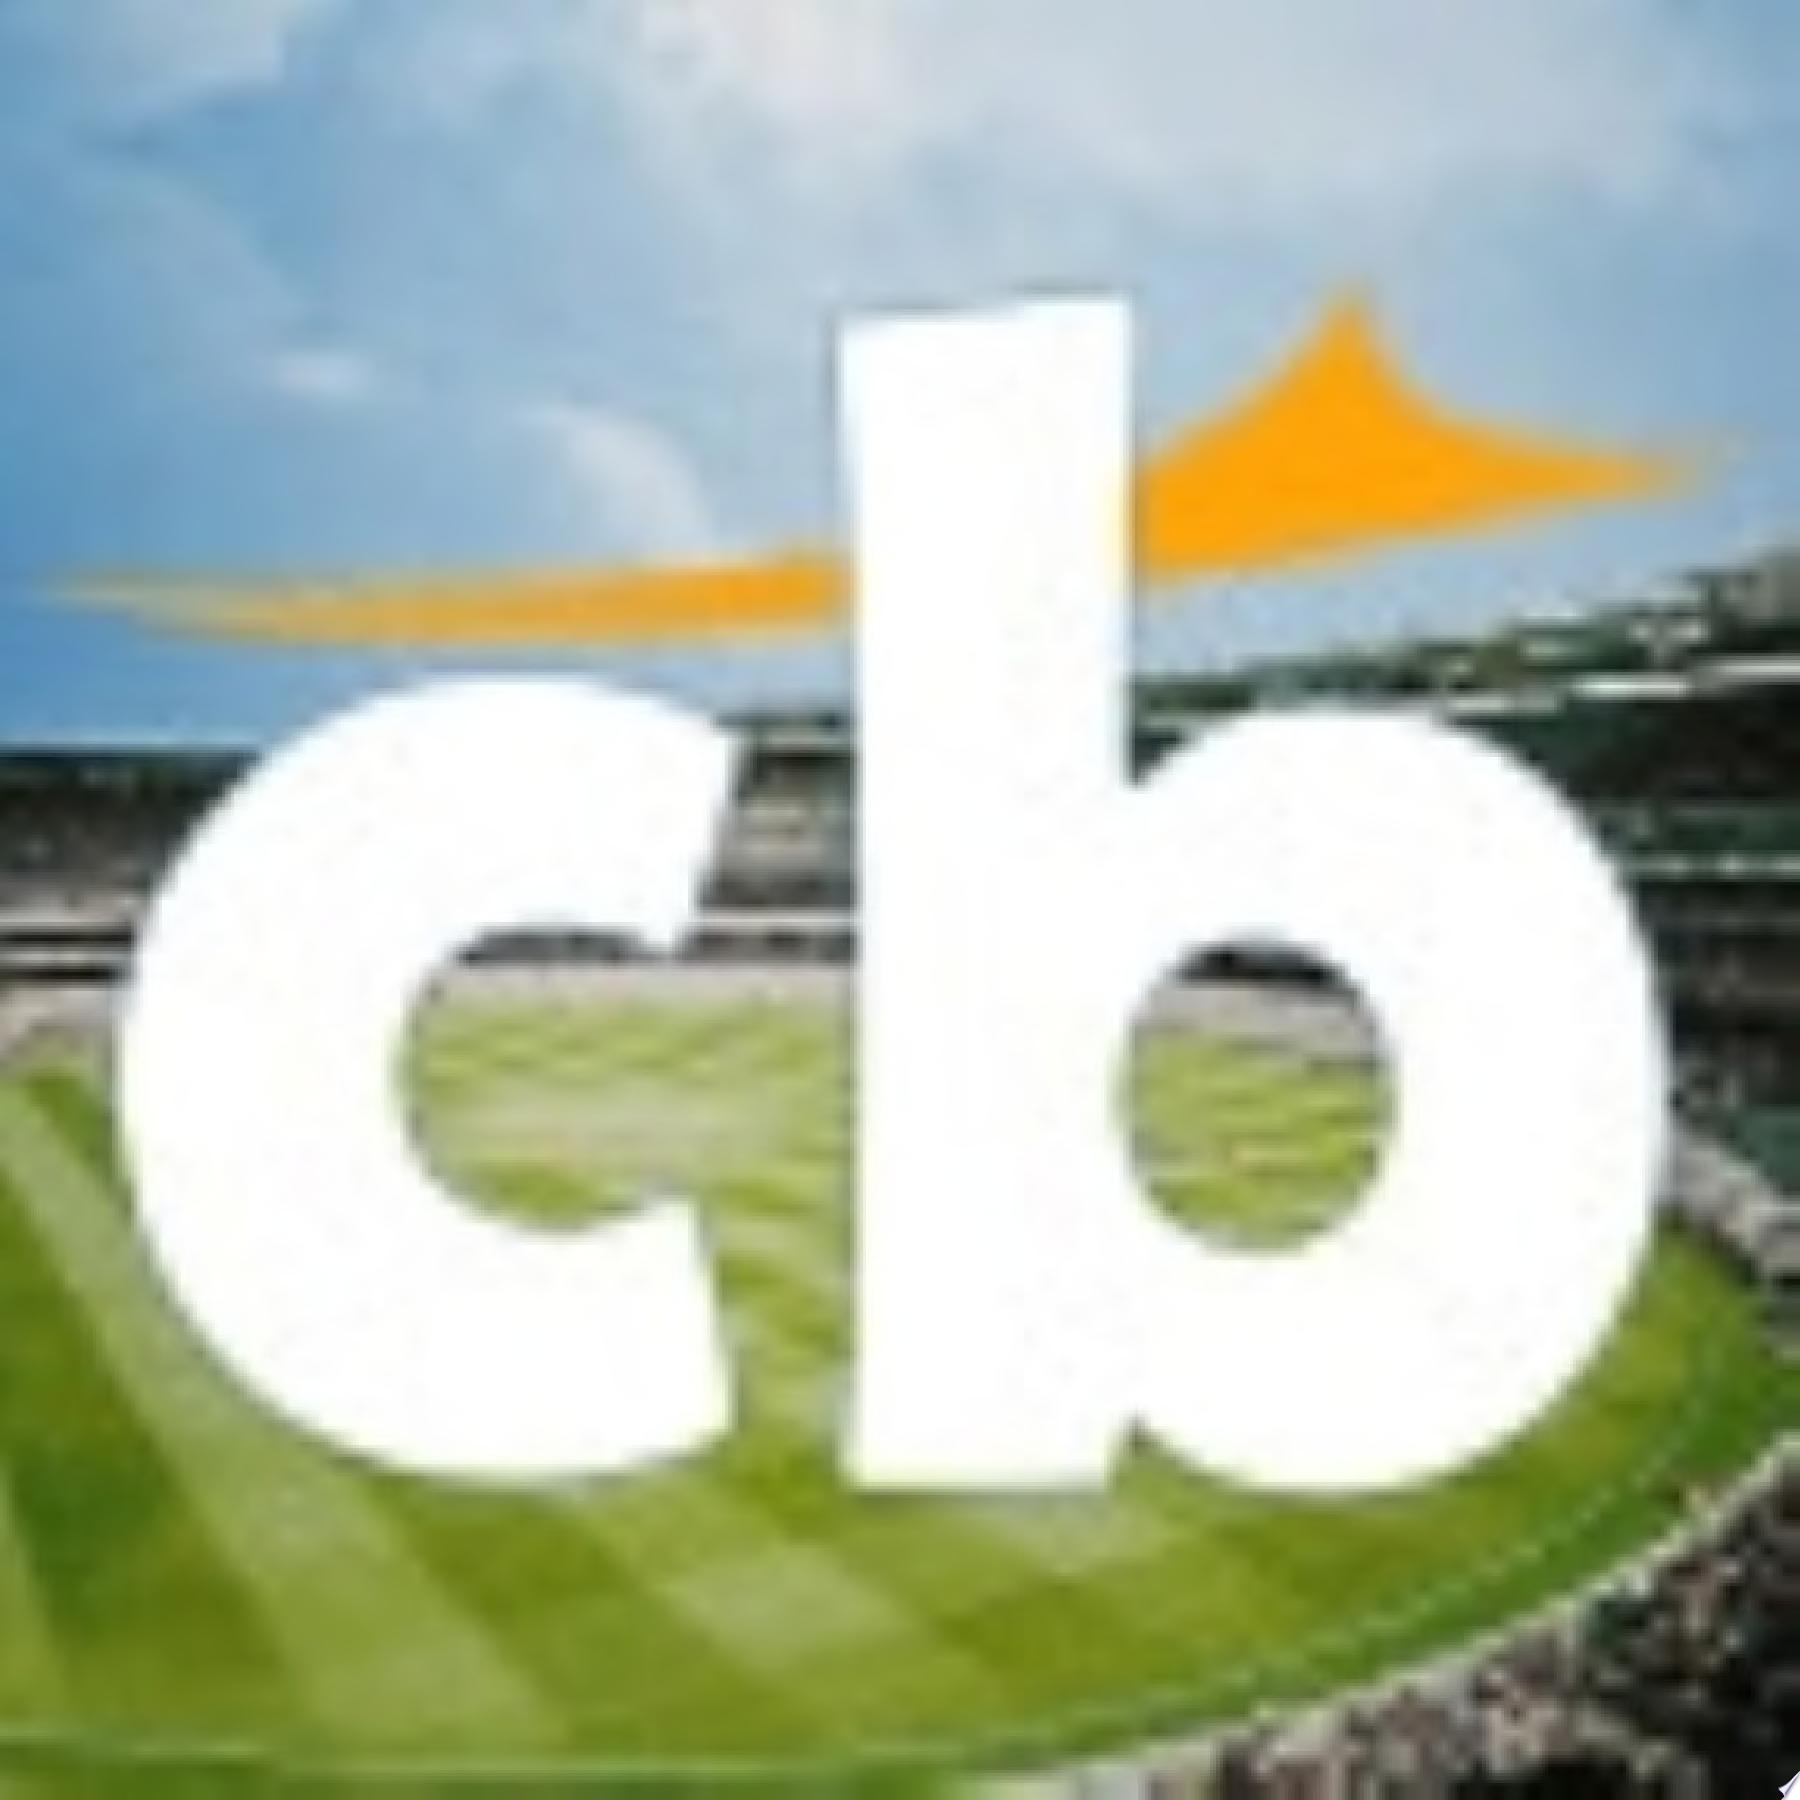 Cricbuzz Cricket Scores   News